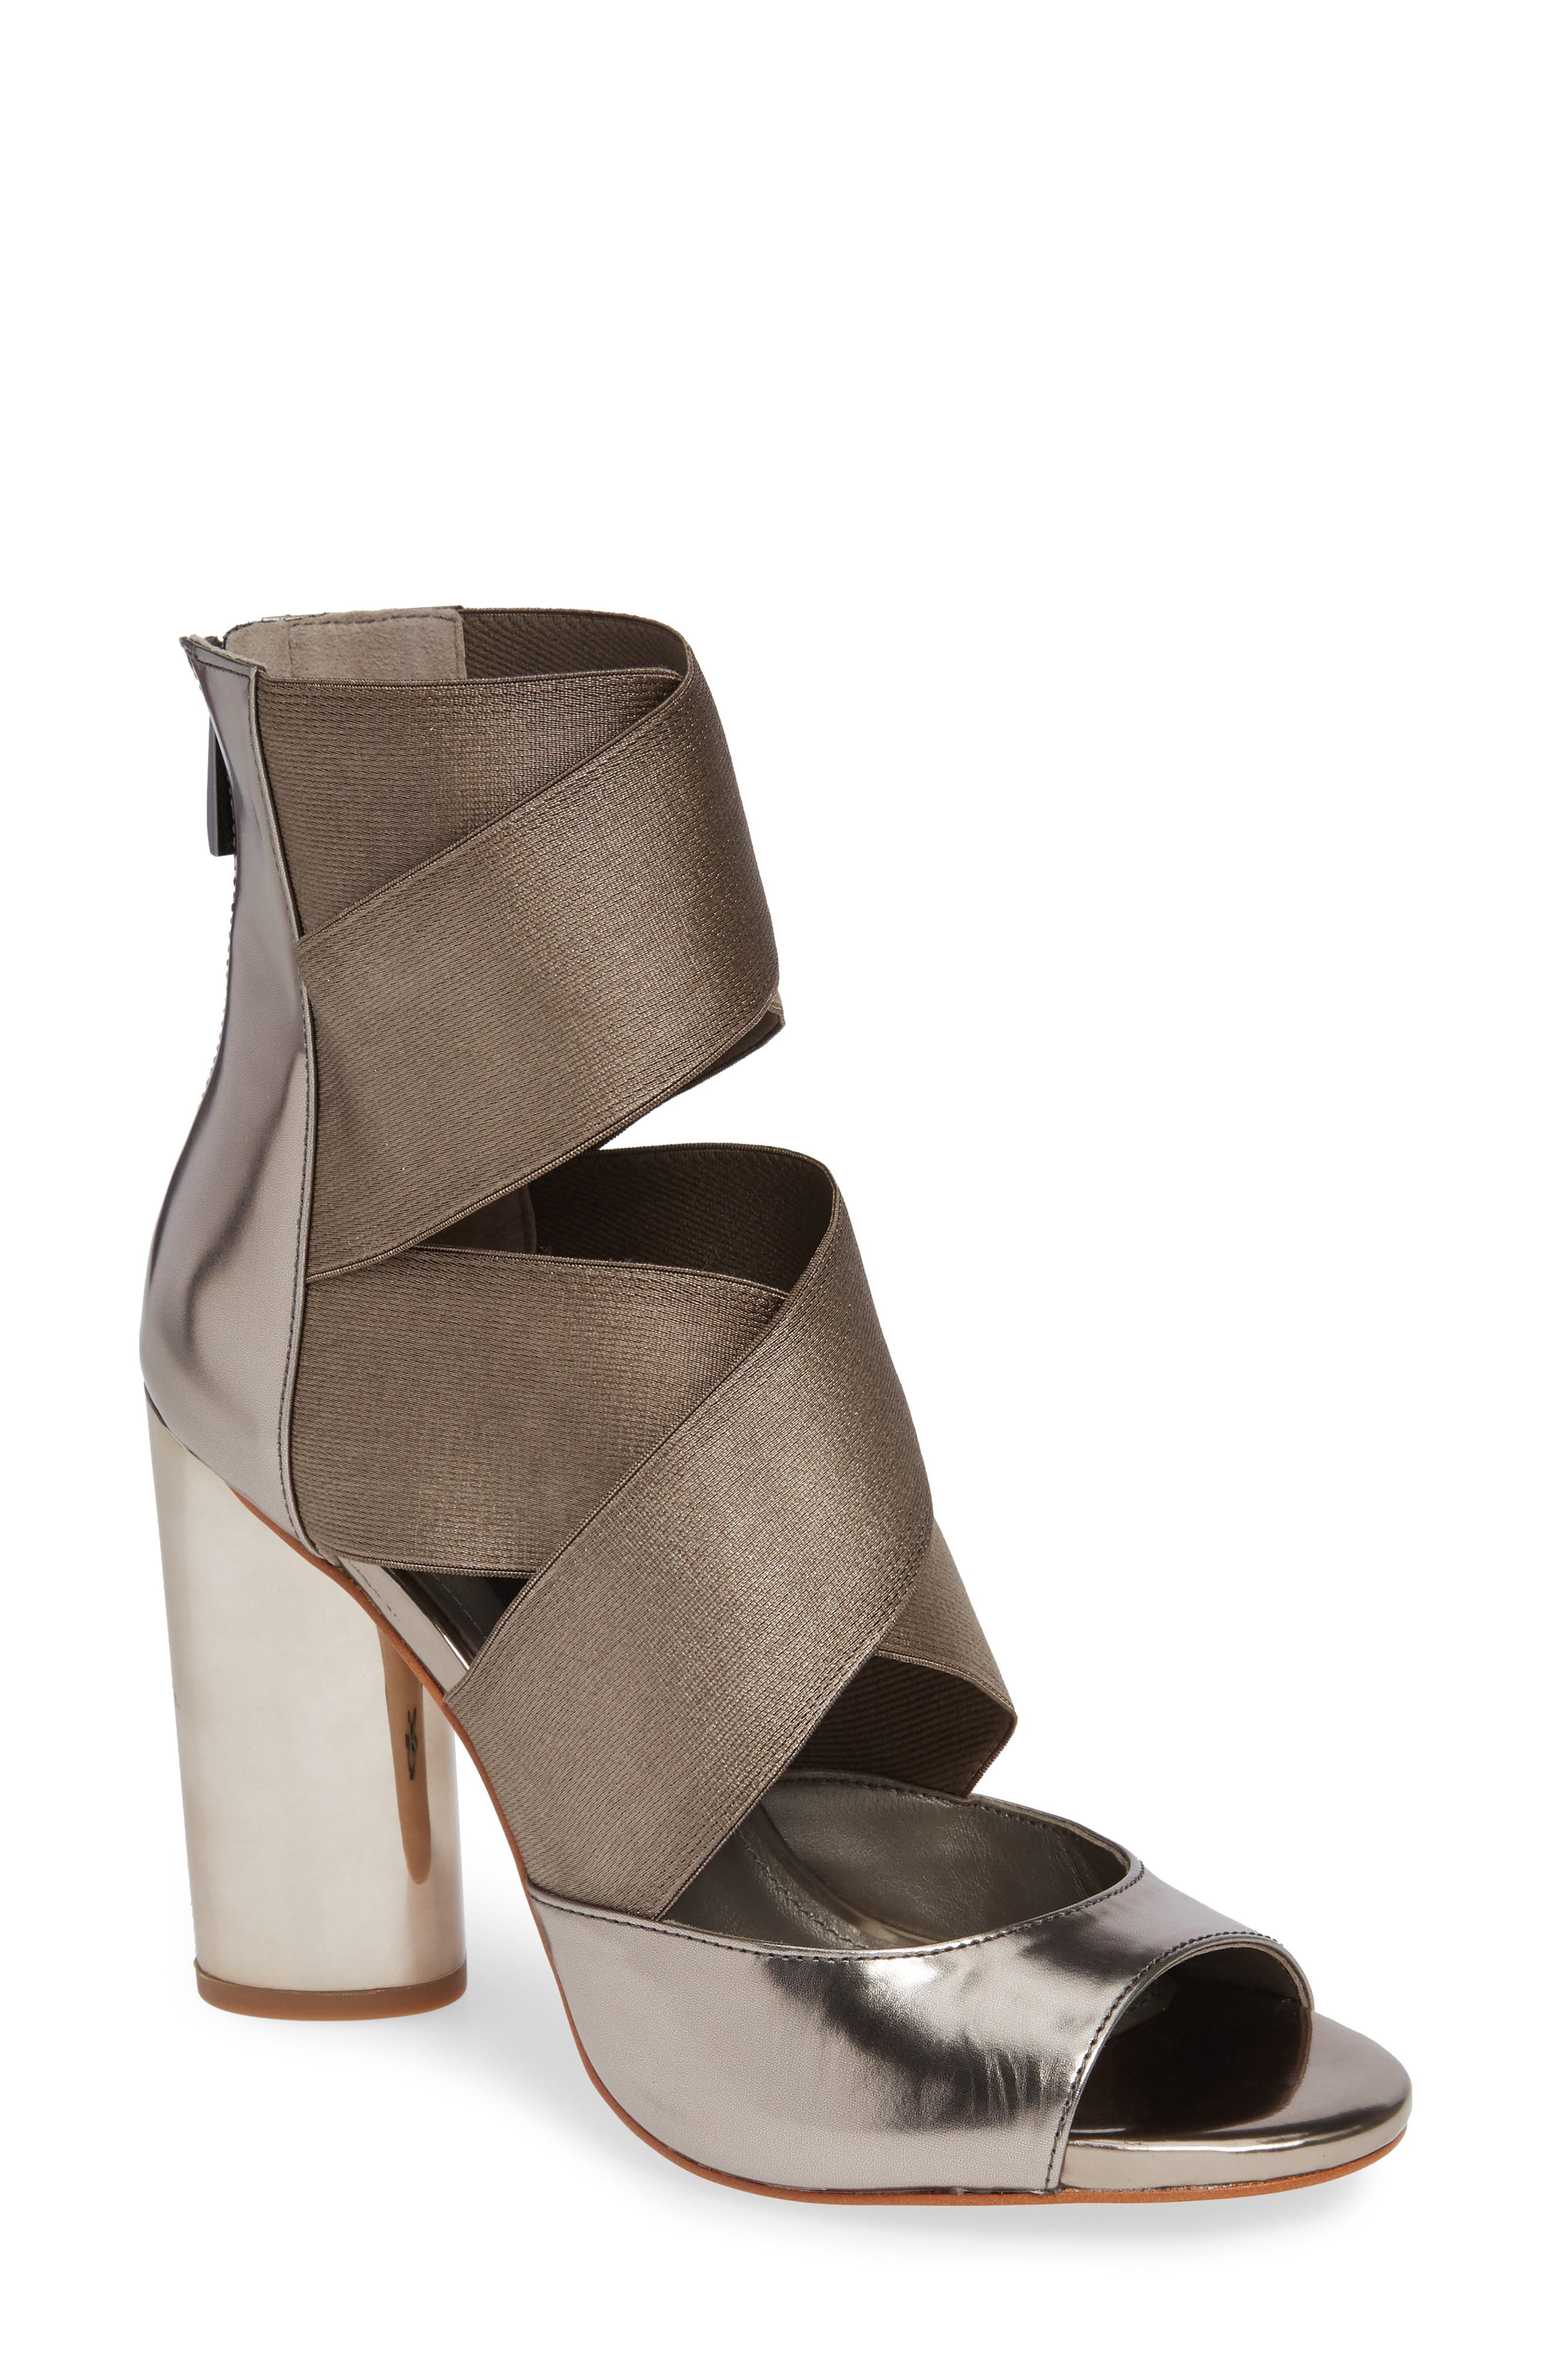 Donna Karan New York Heels, Pumps & High Heel scarpe for Donna